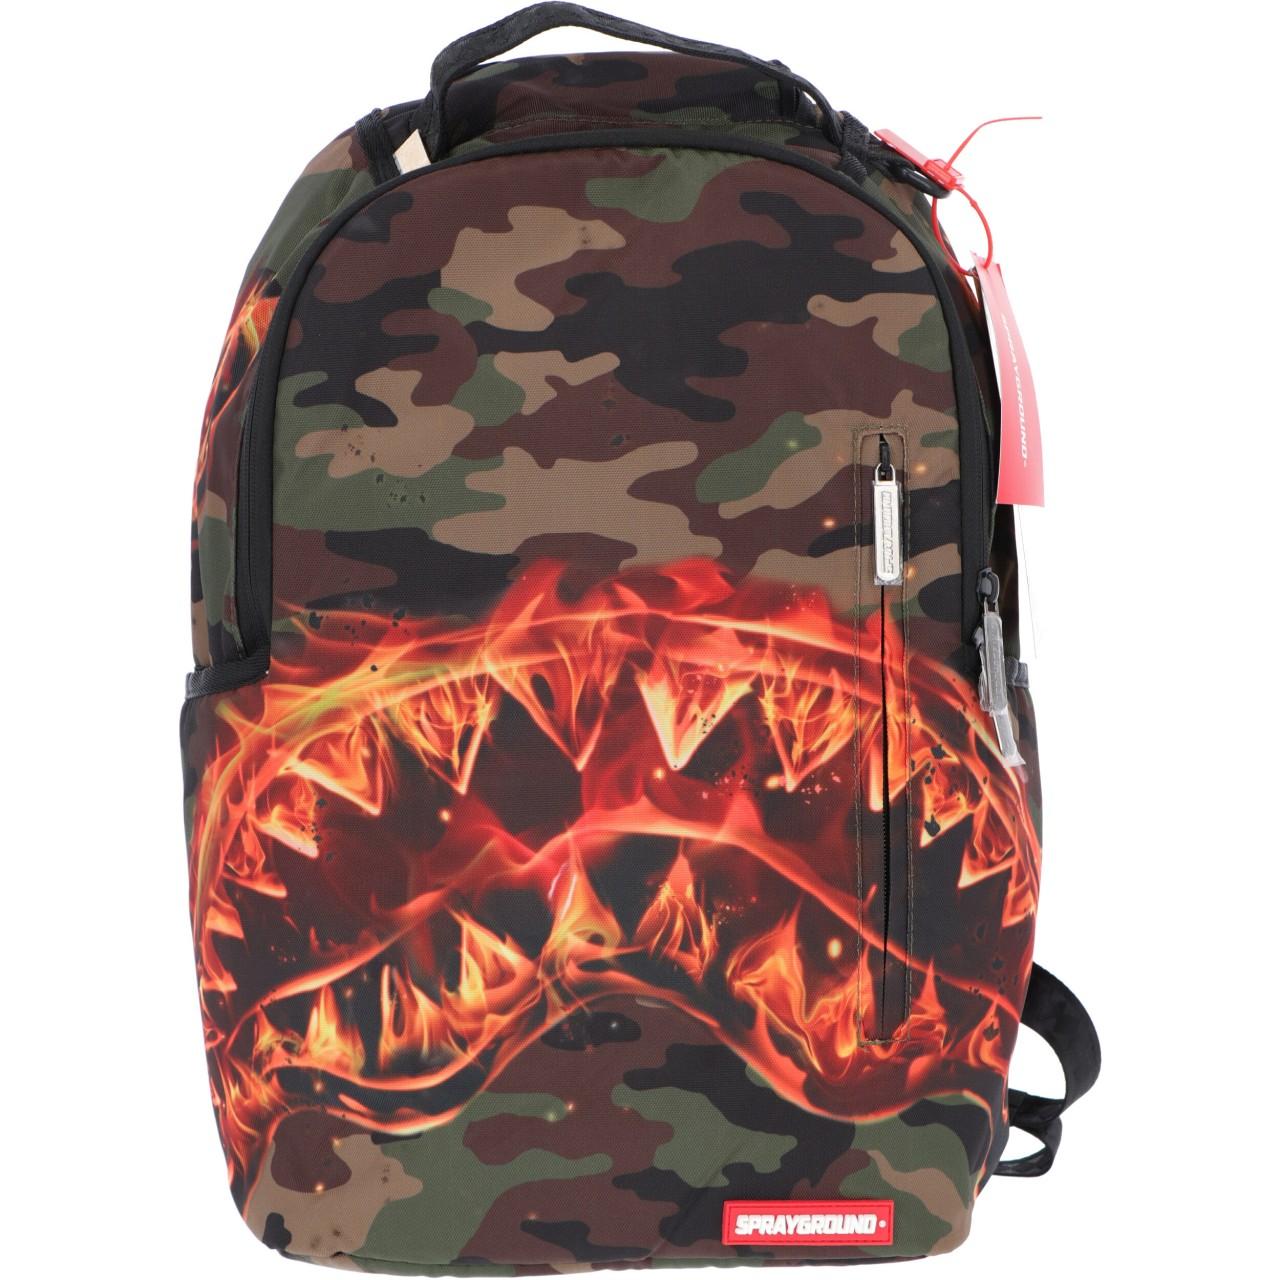 Sprayground Uomo Zaino Sprayground Fire Shark Backpack 2221O